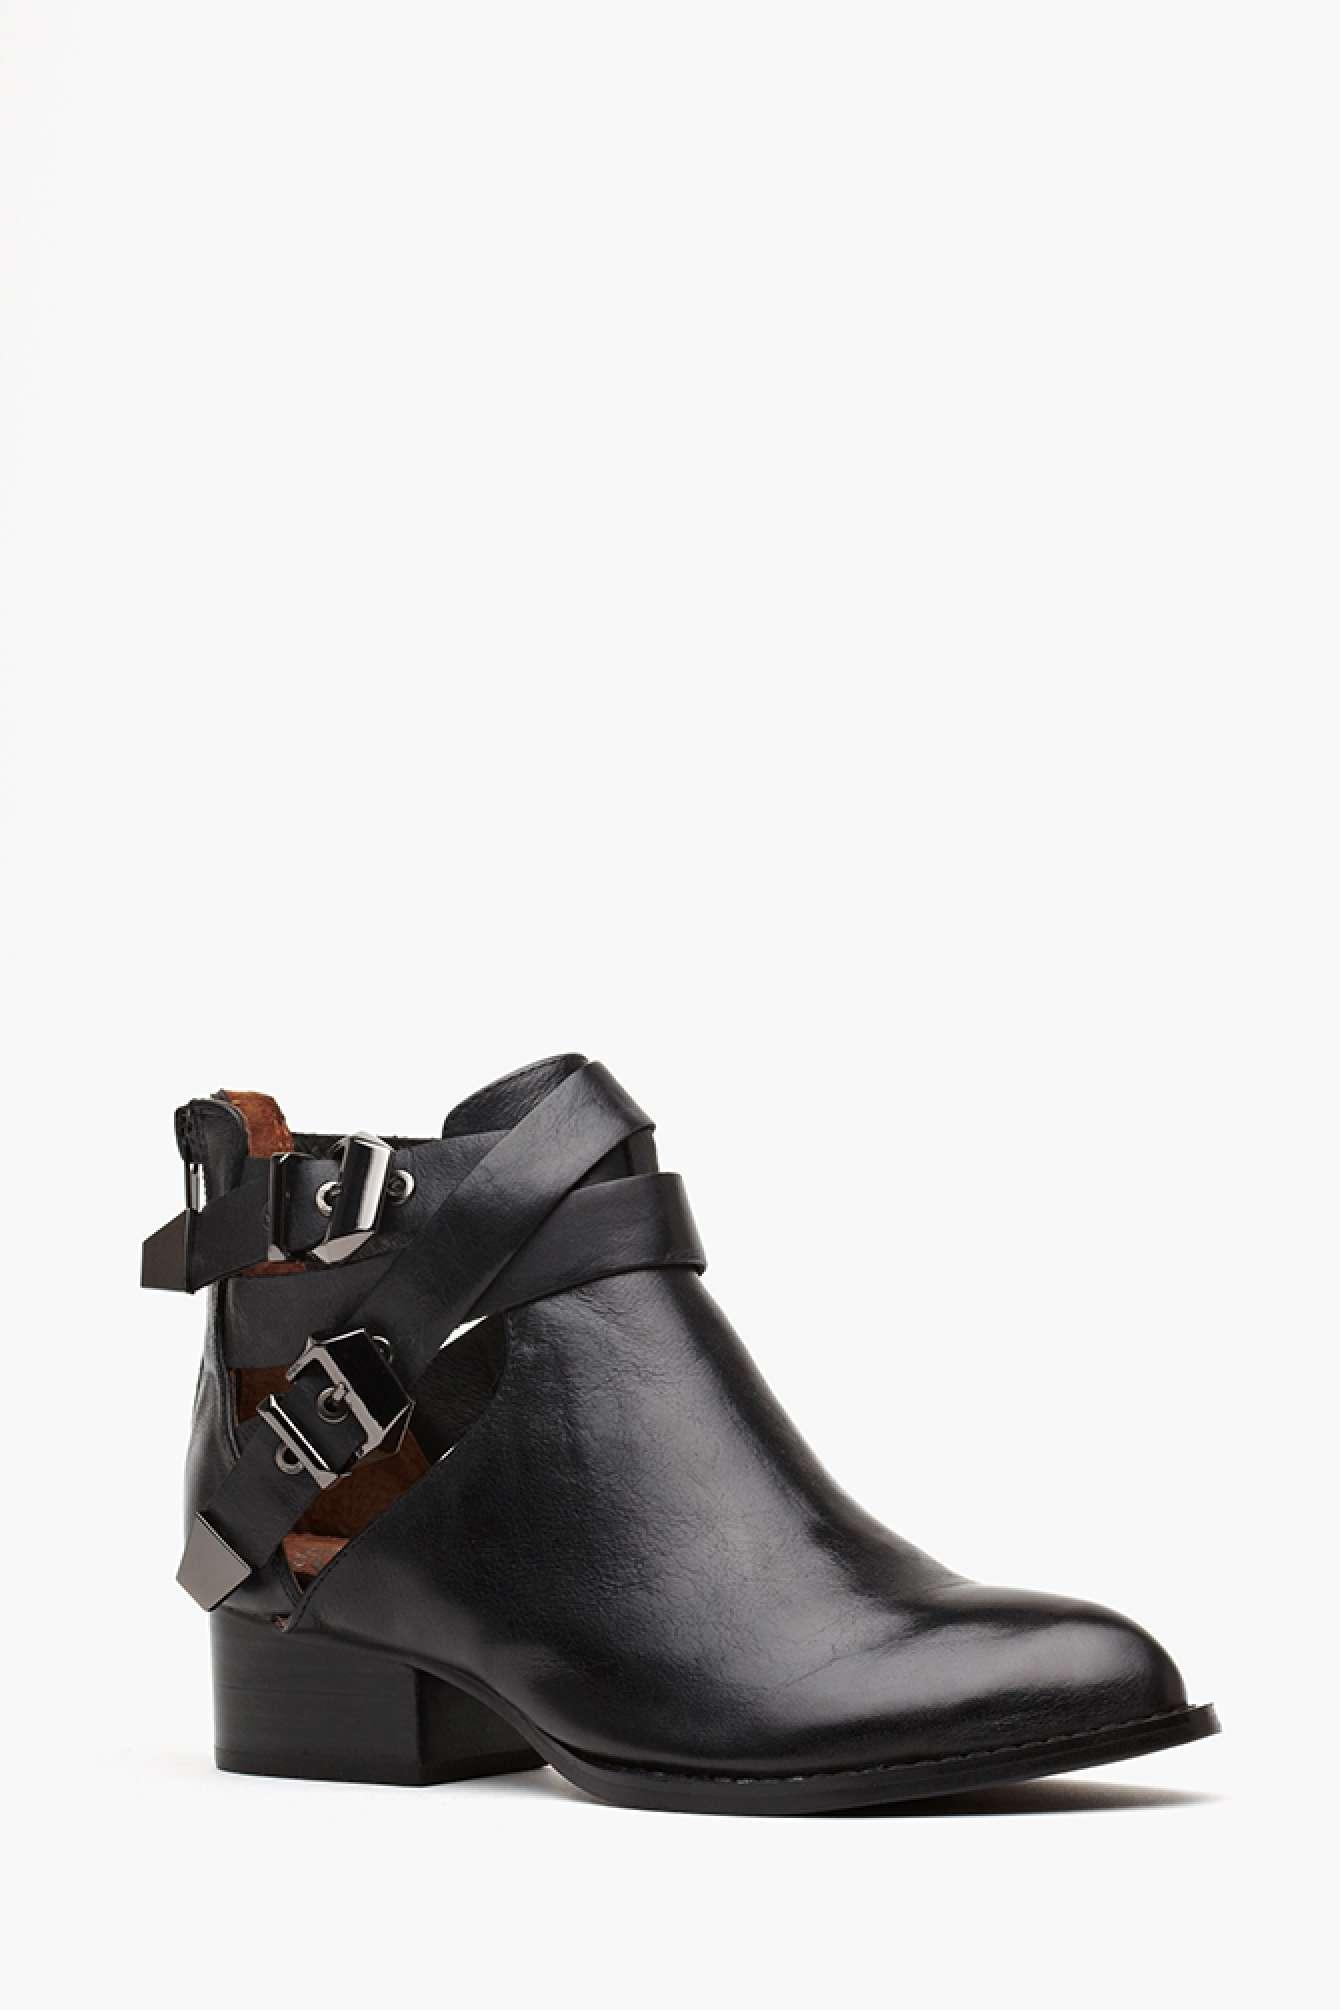 Jeffrey campbell everly cutout boot